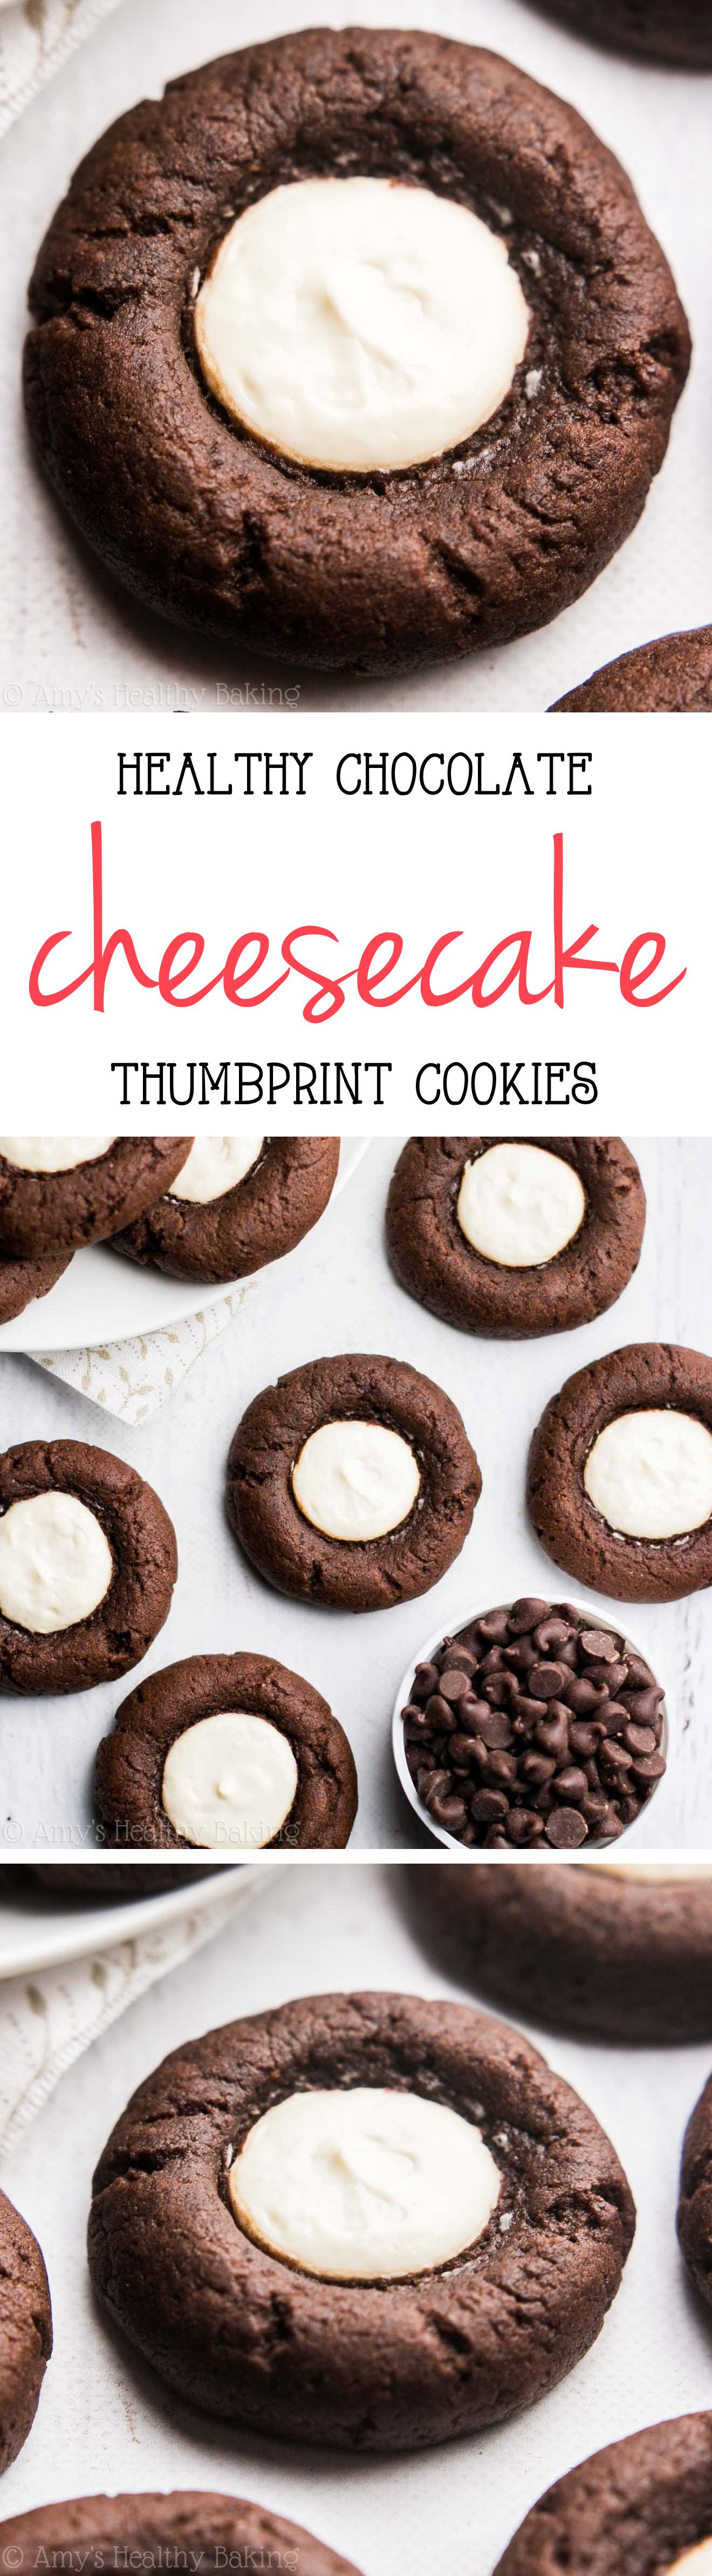 Dark Chocolate Cheesecake Thumbprint Cookies | Amy's Healthy Baking